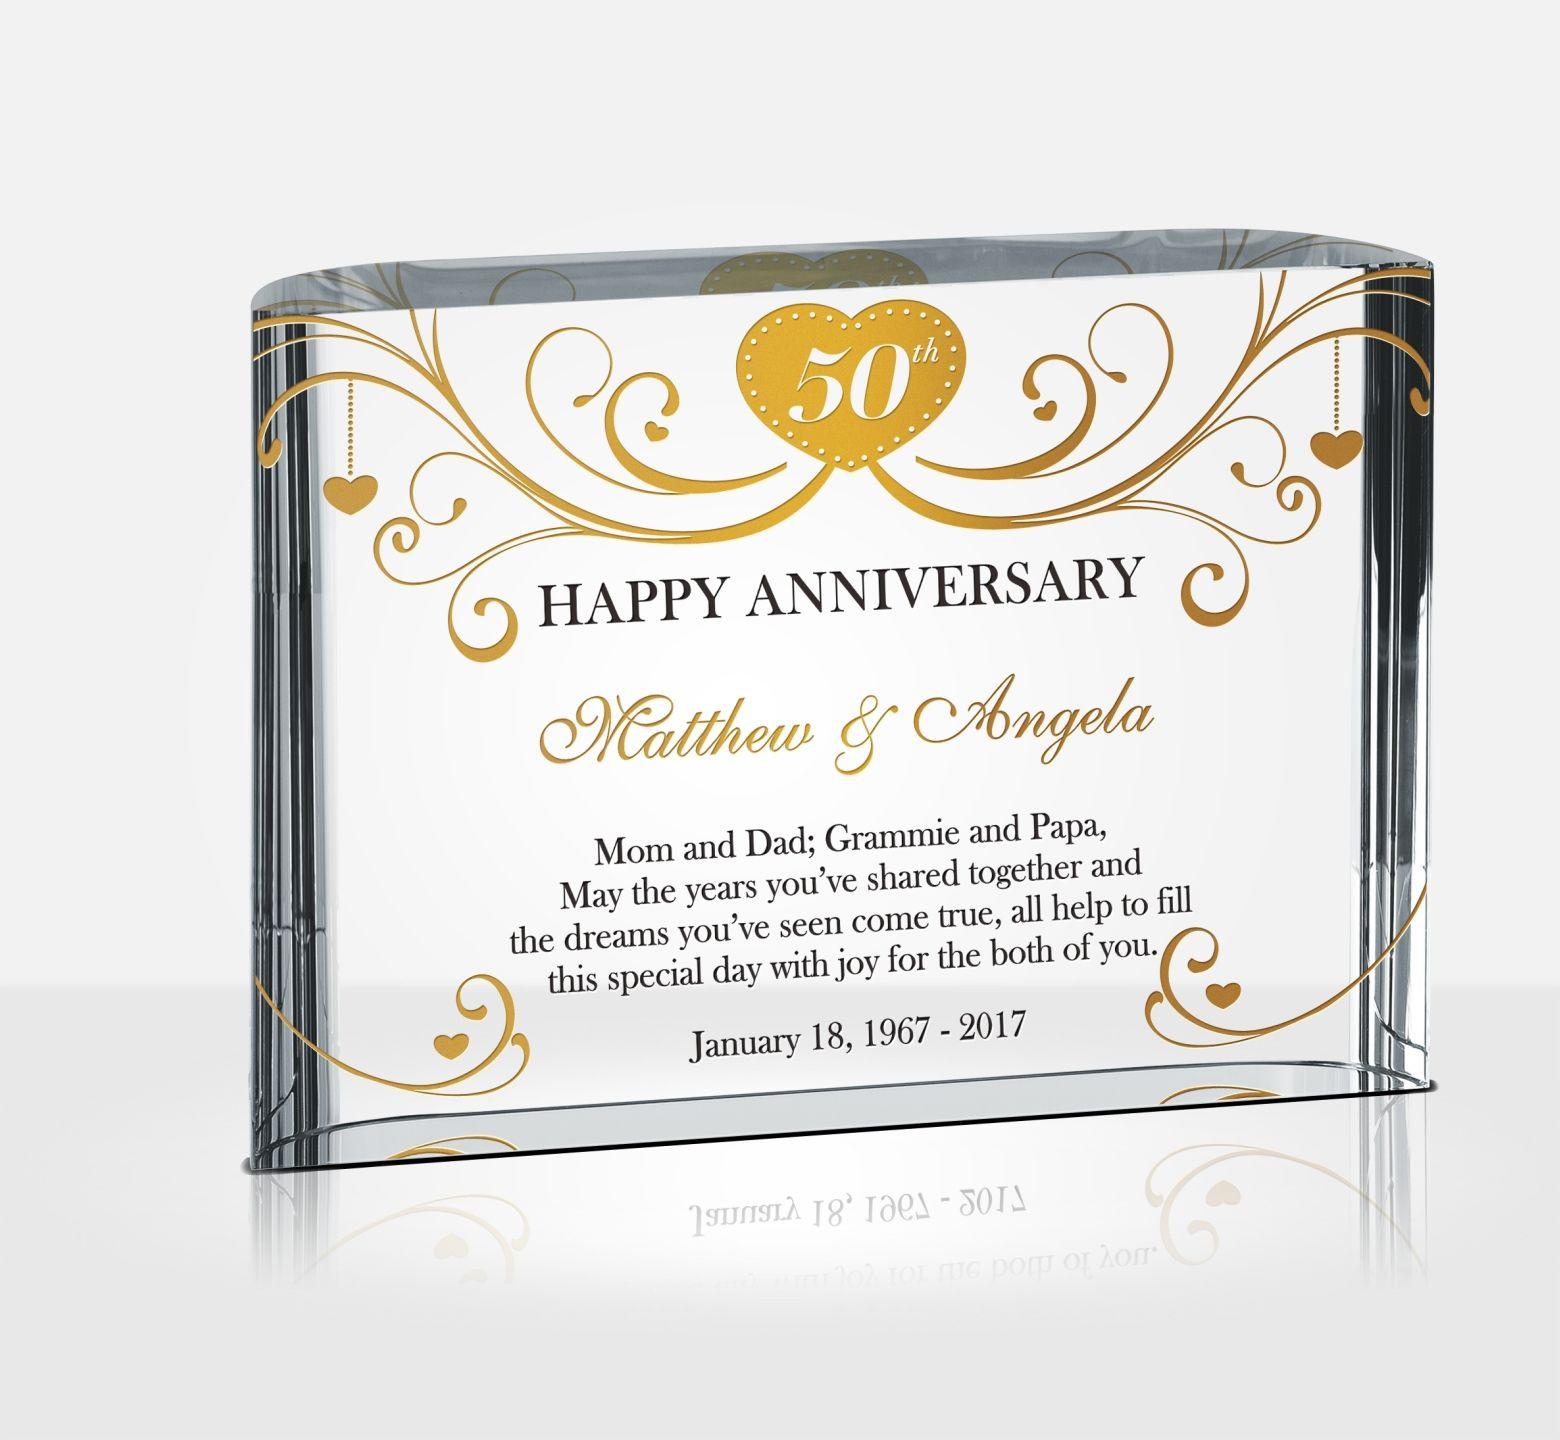 Golden Anniversary Gift Ideas  50th Golden Wedding Anniversary Gifts DIY Awards